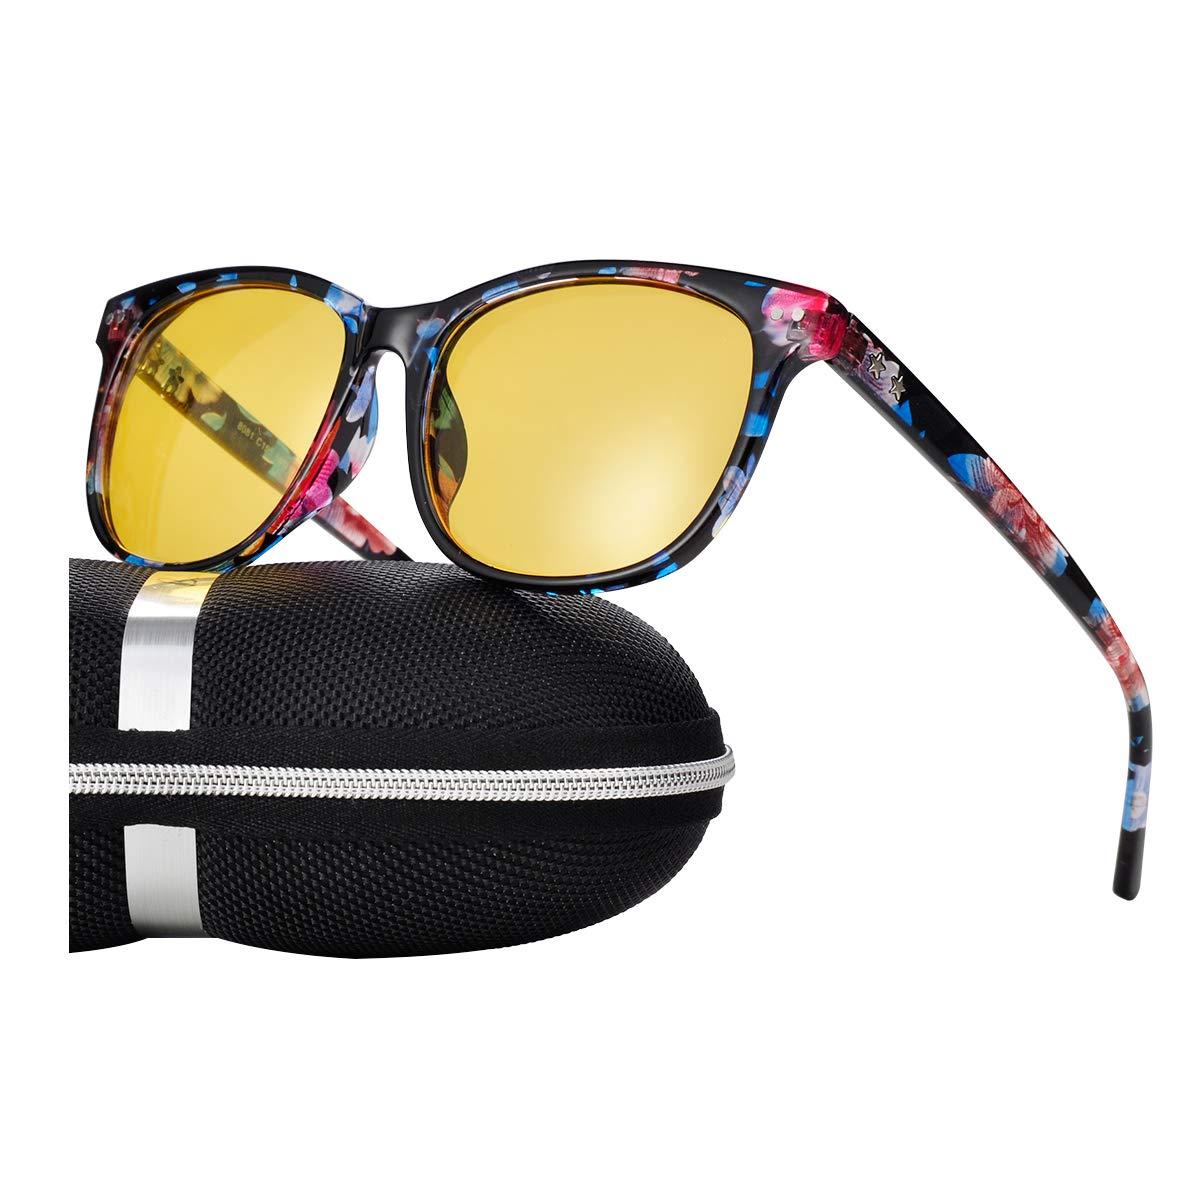 Night Vision Driving Glasses Polarized Anti-glare Clear Sun Glasses Men & Women Fashion(Floral)